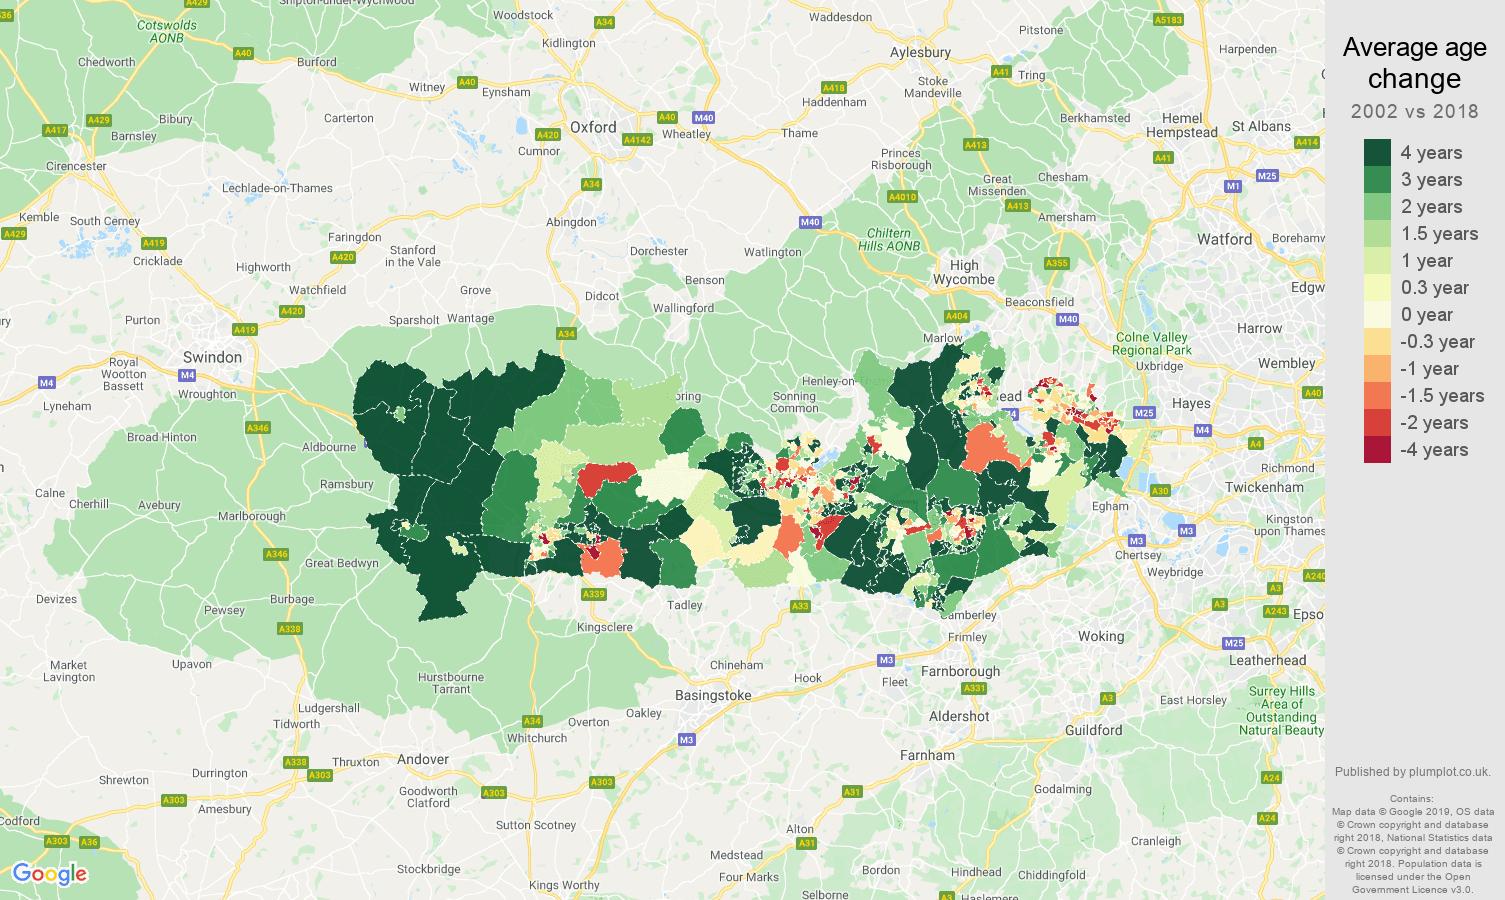 Berkshire average age change map